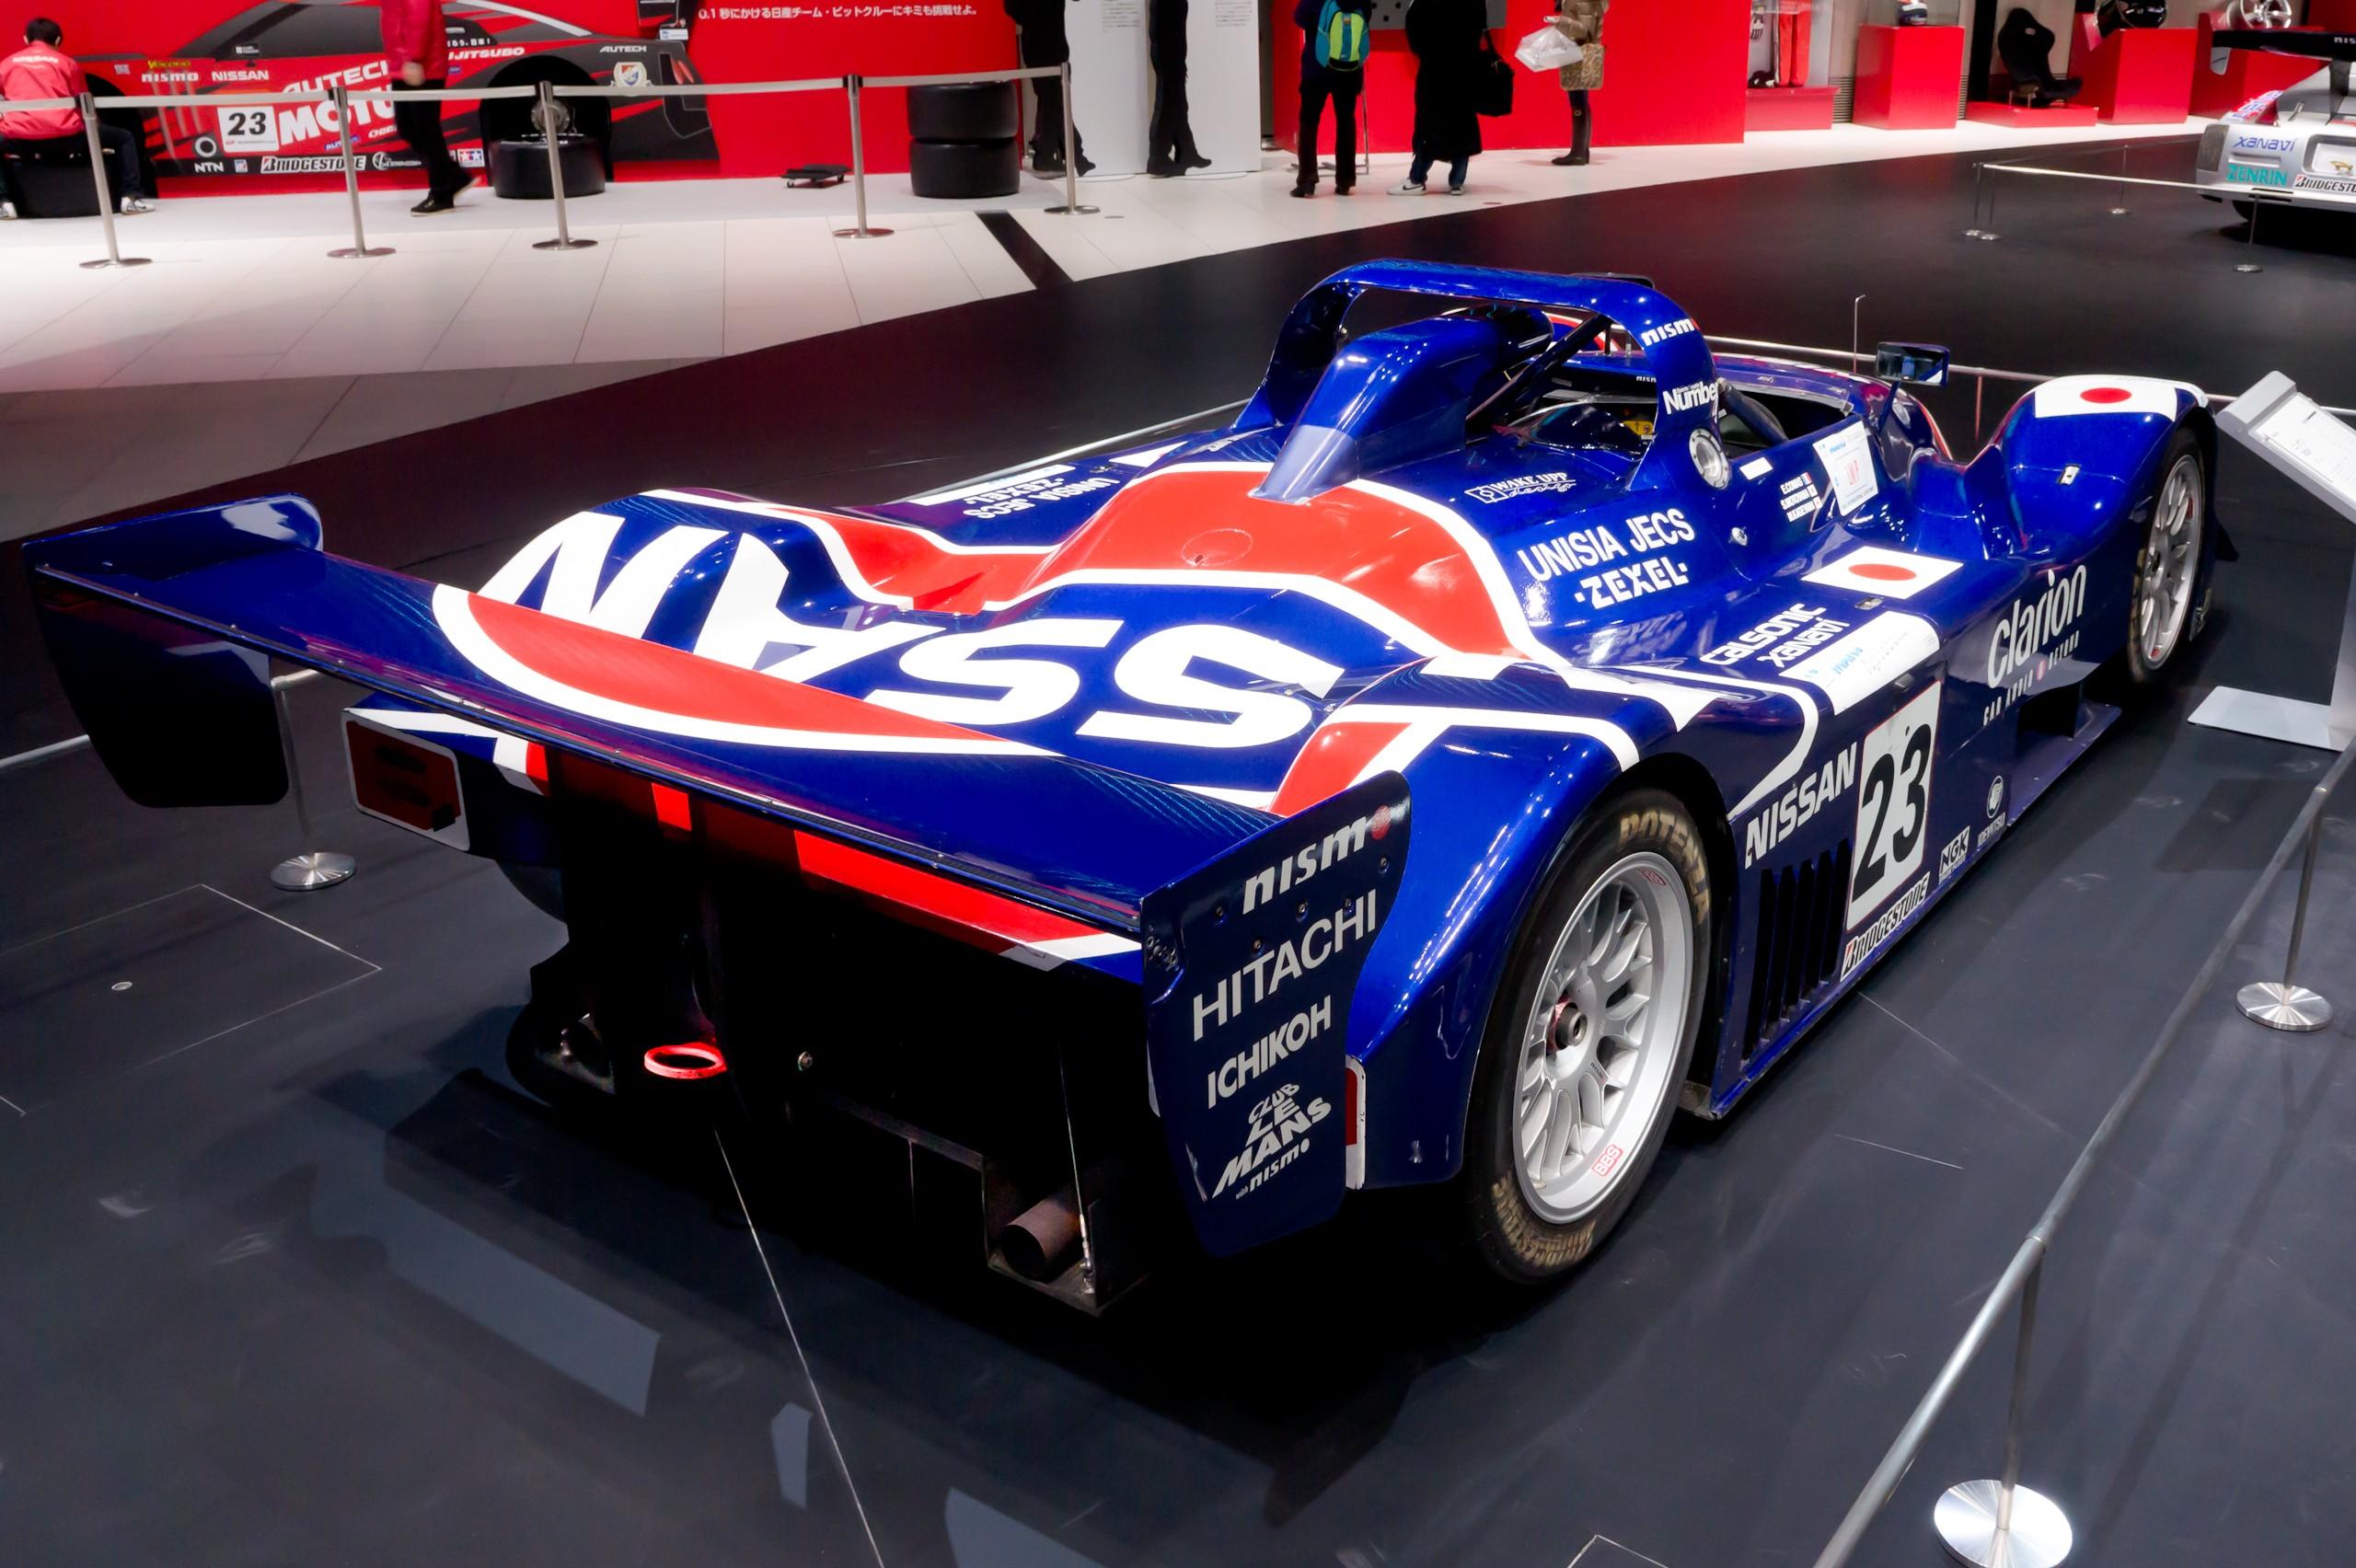 Nissan_R391_rear.jpg